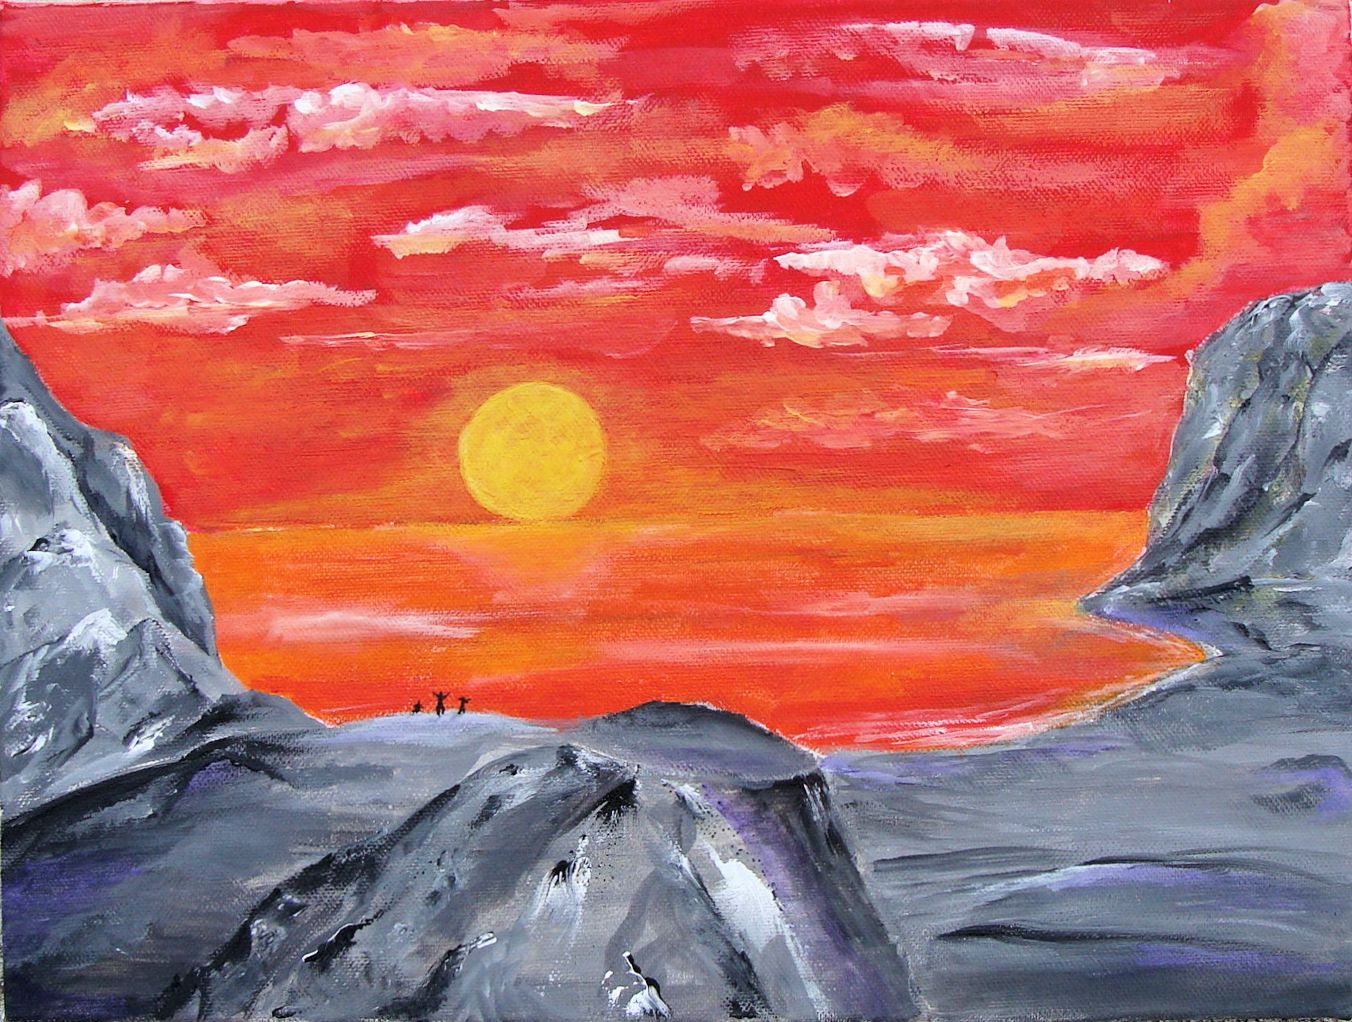 Journey XVIII - Sunset Bay by sanntta82